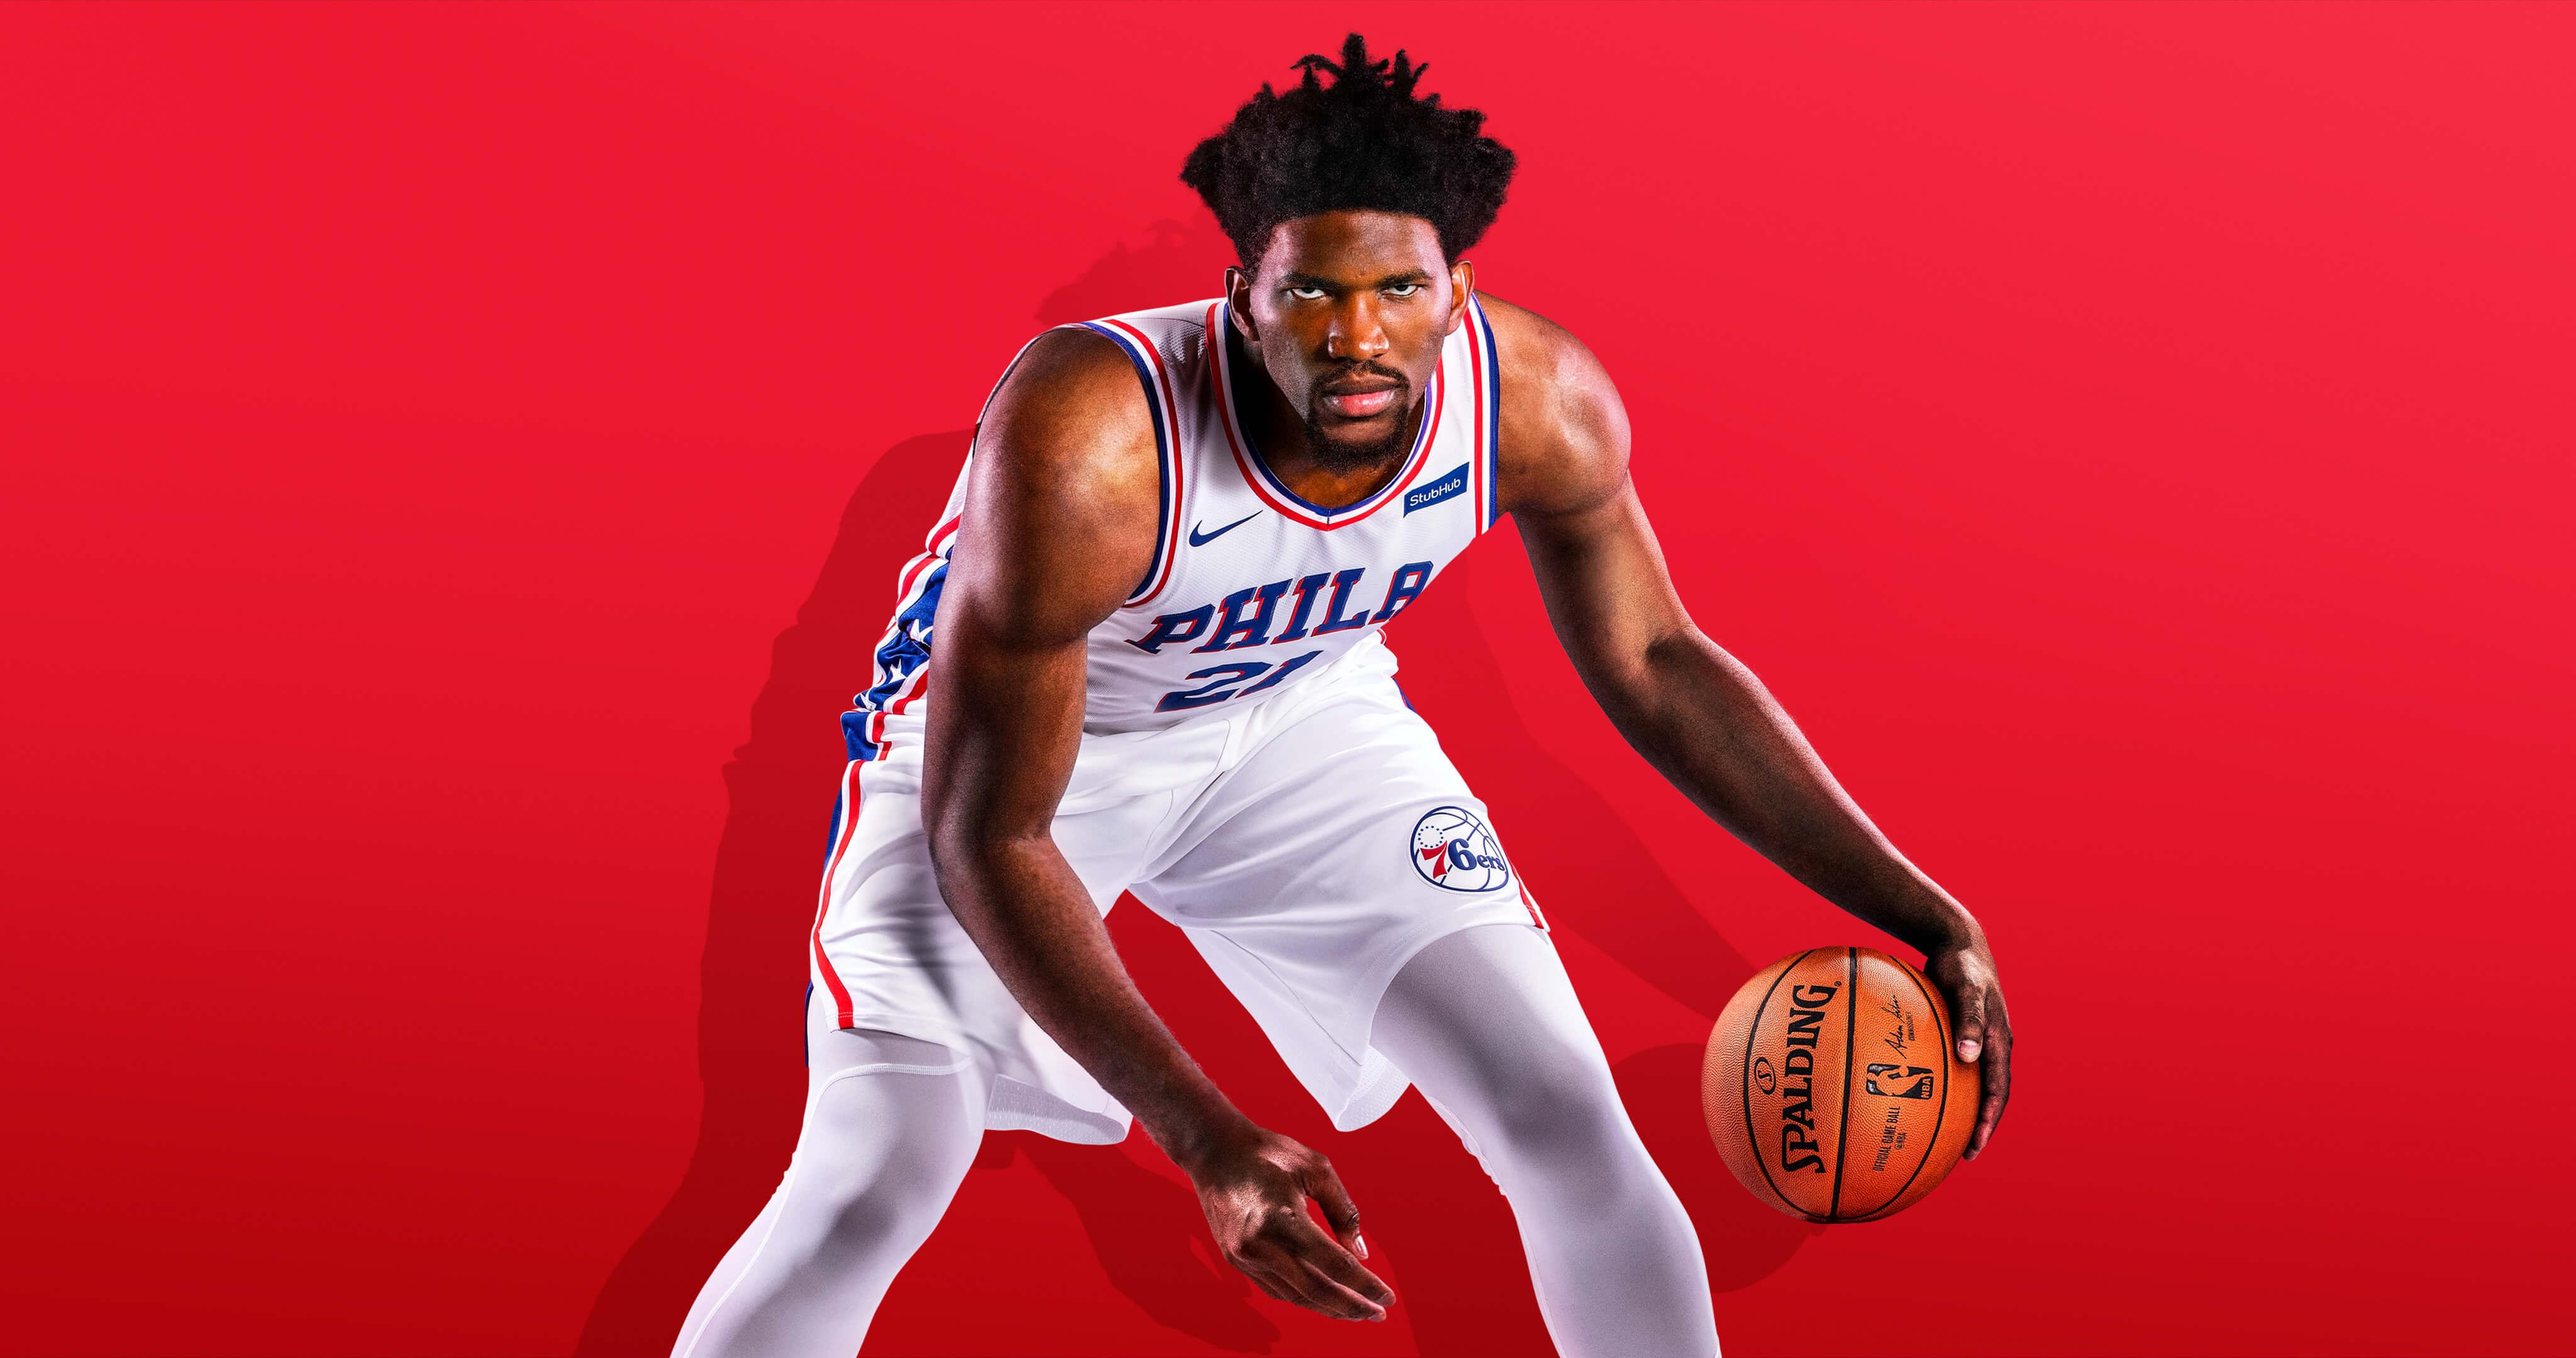 Looks Like EA's NBA Live Is Being Weird Again